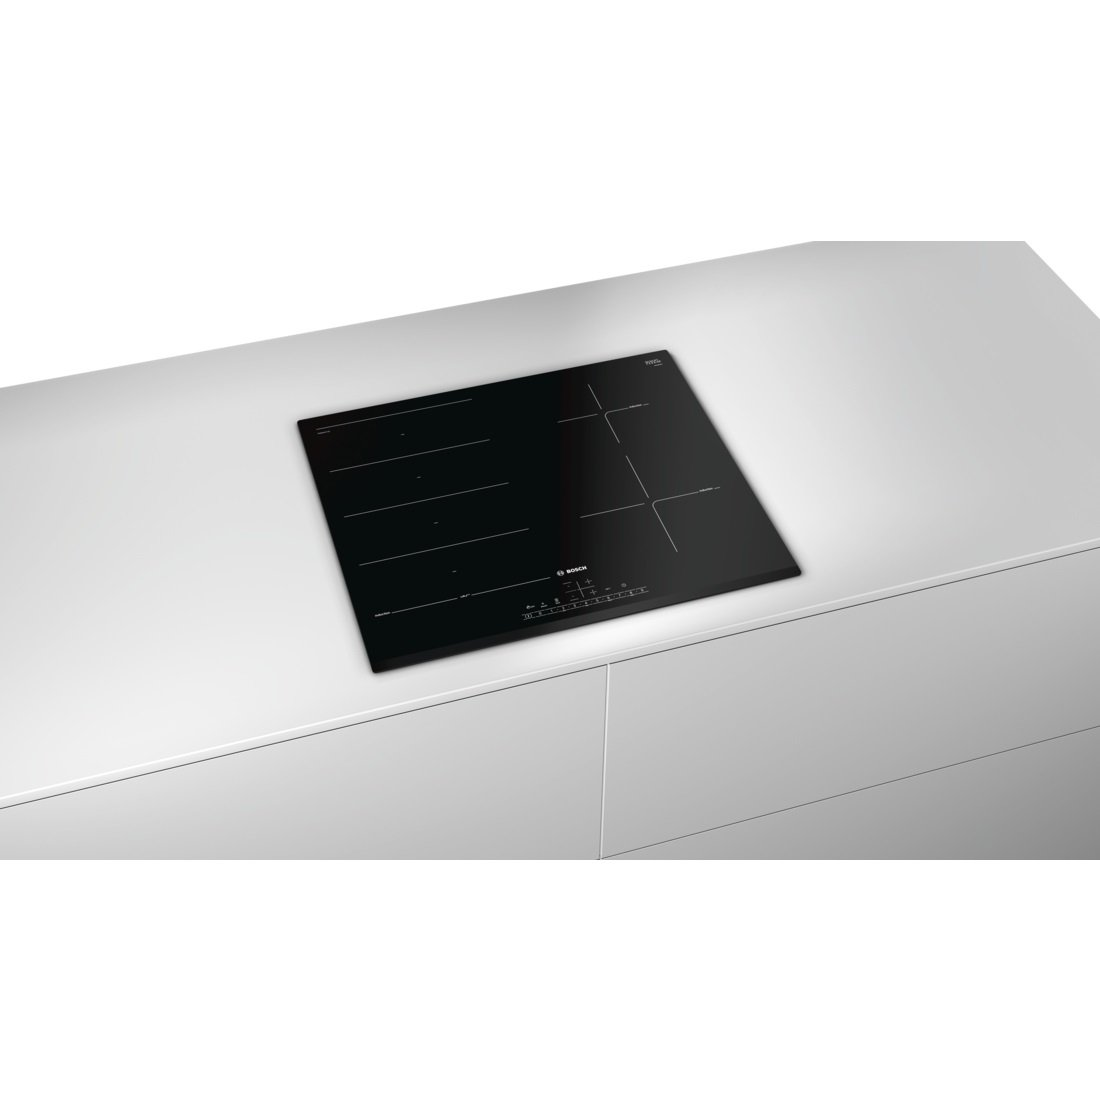 sélection premium e236c 1184e Bosch Series 6 PXE631FC1E Built-In Black Ceramic Glass ...